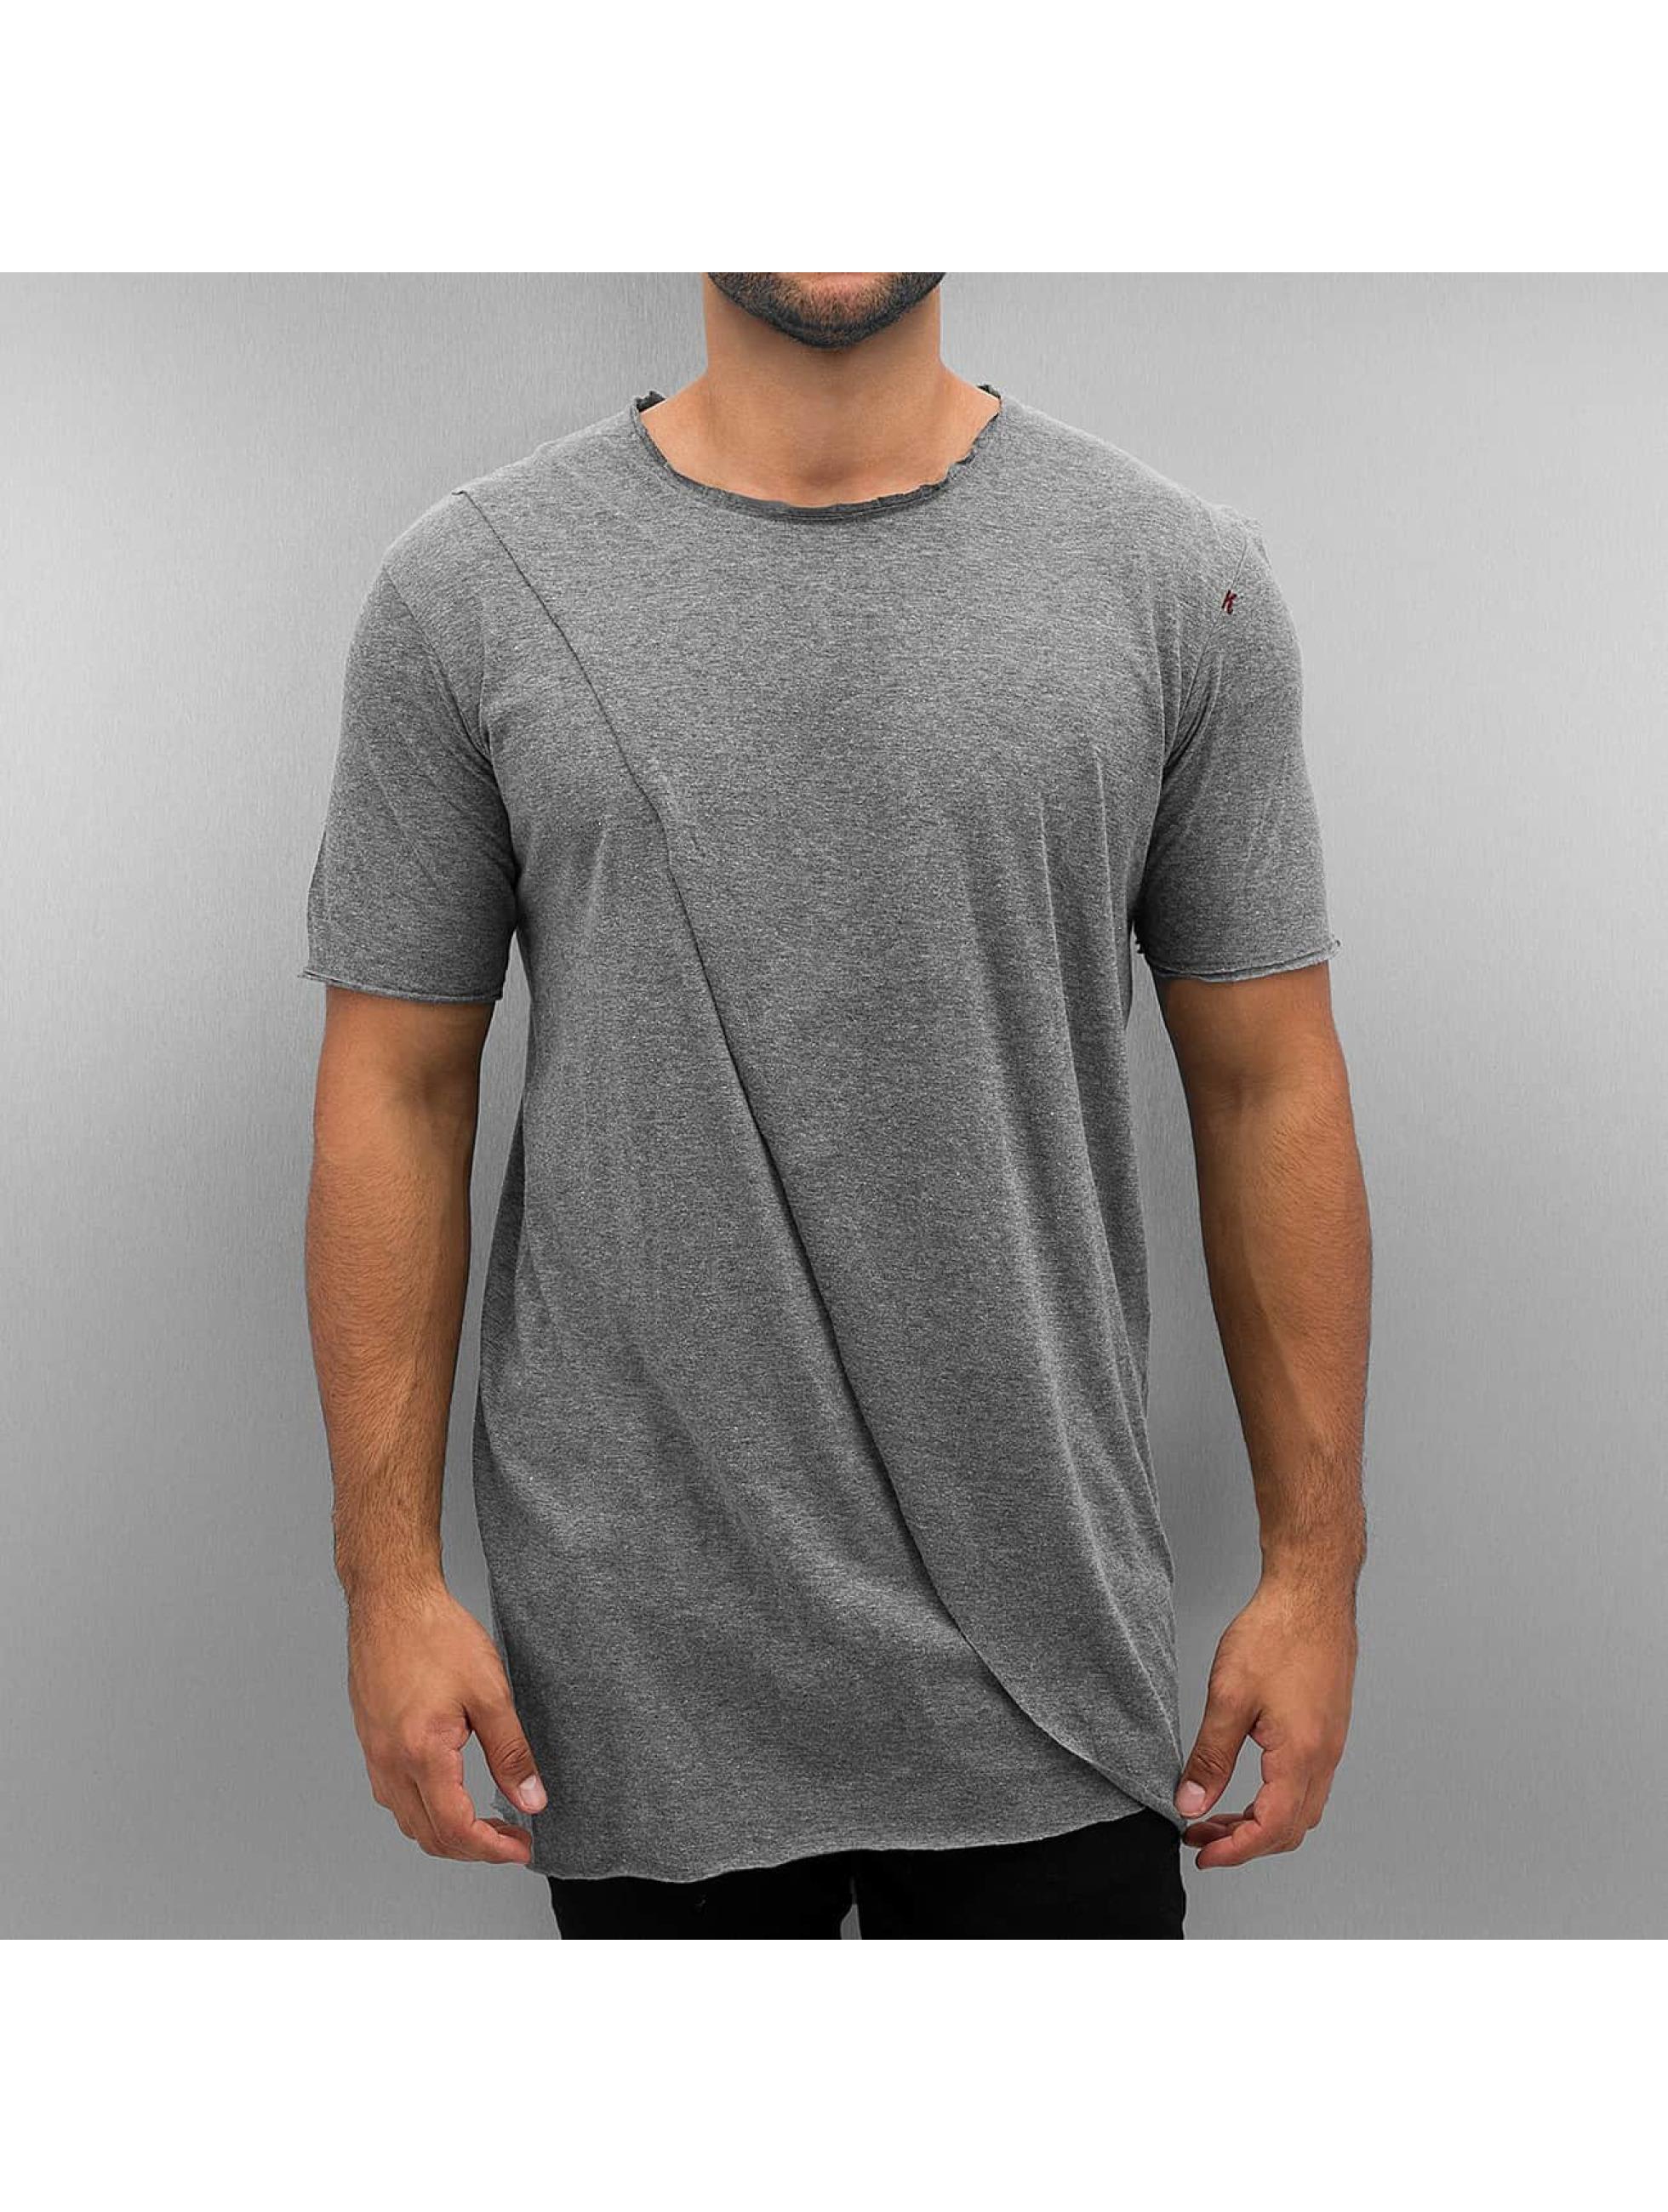 Khujo Tyrell T-Shirt Grey Sale Angebote Döbern